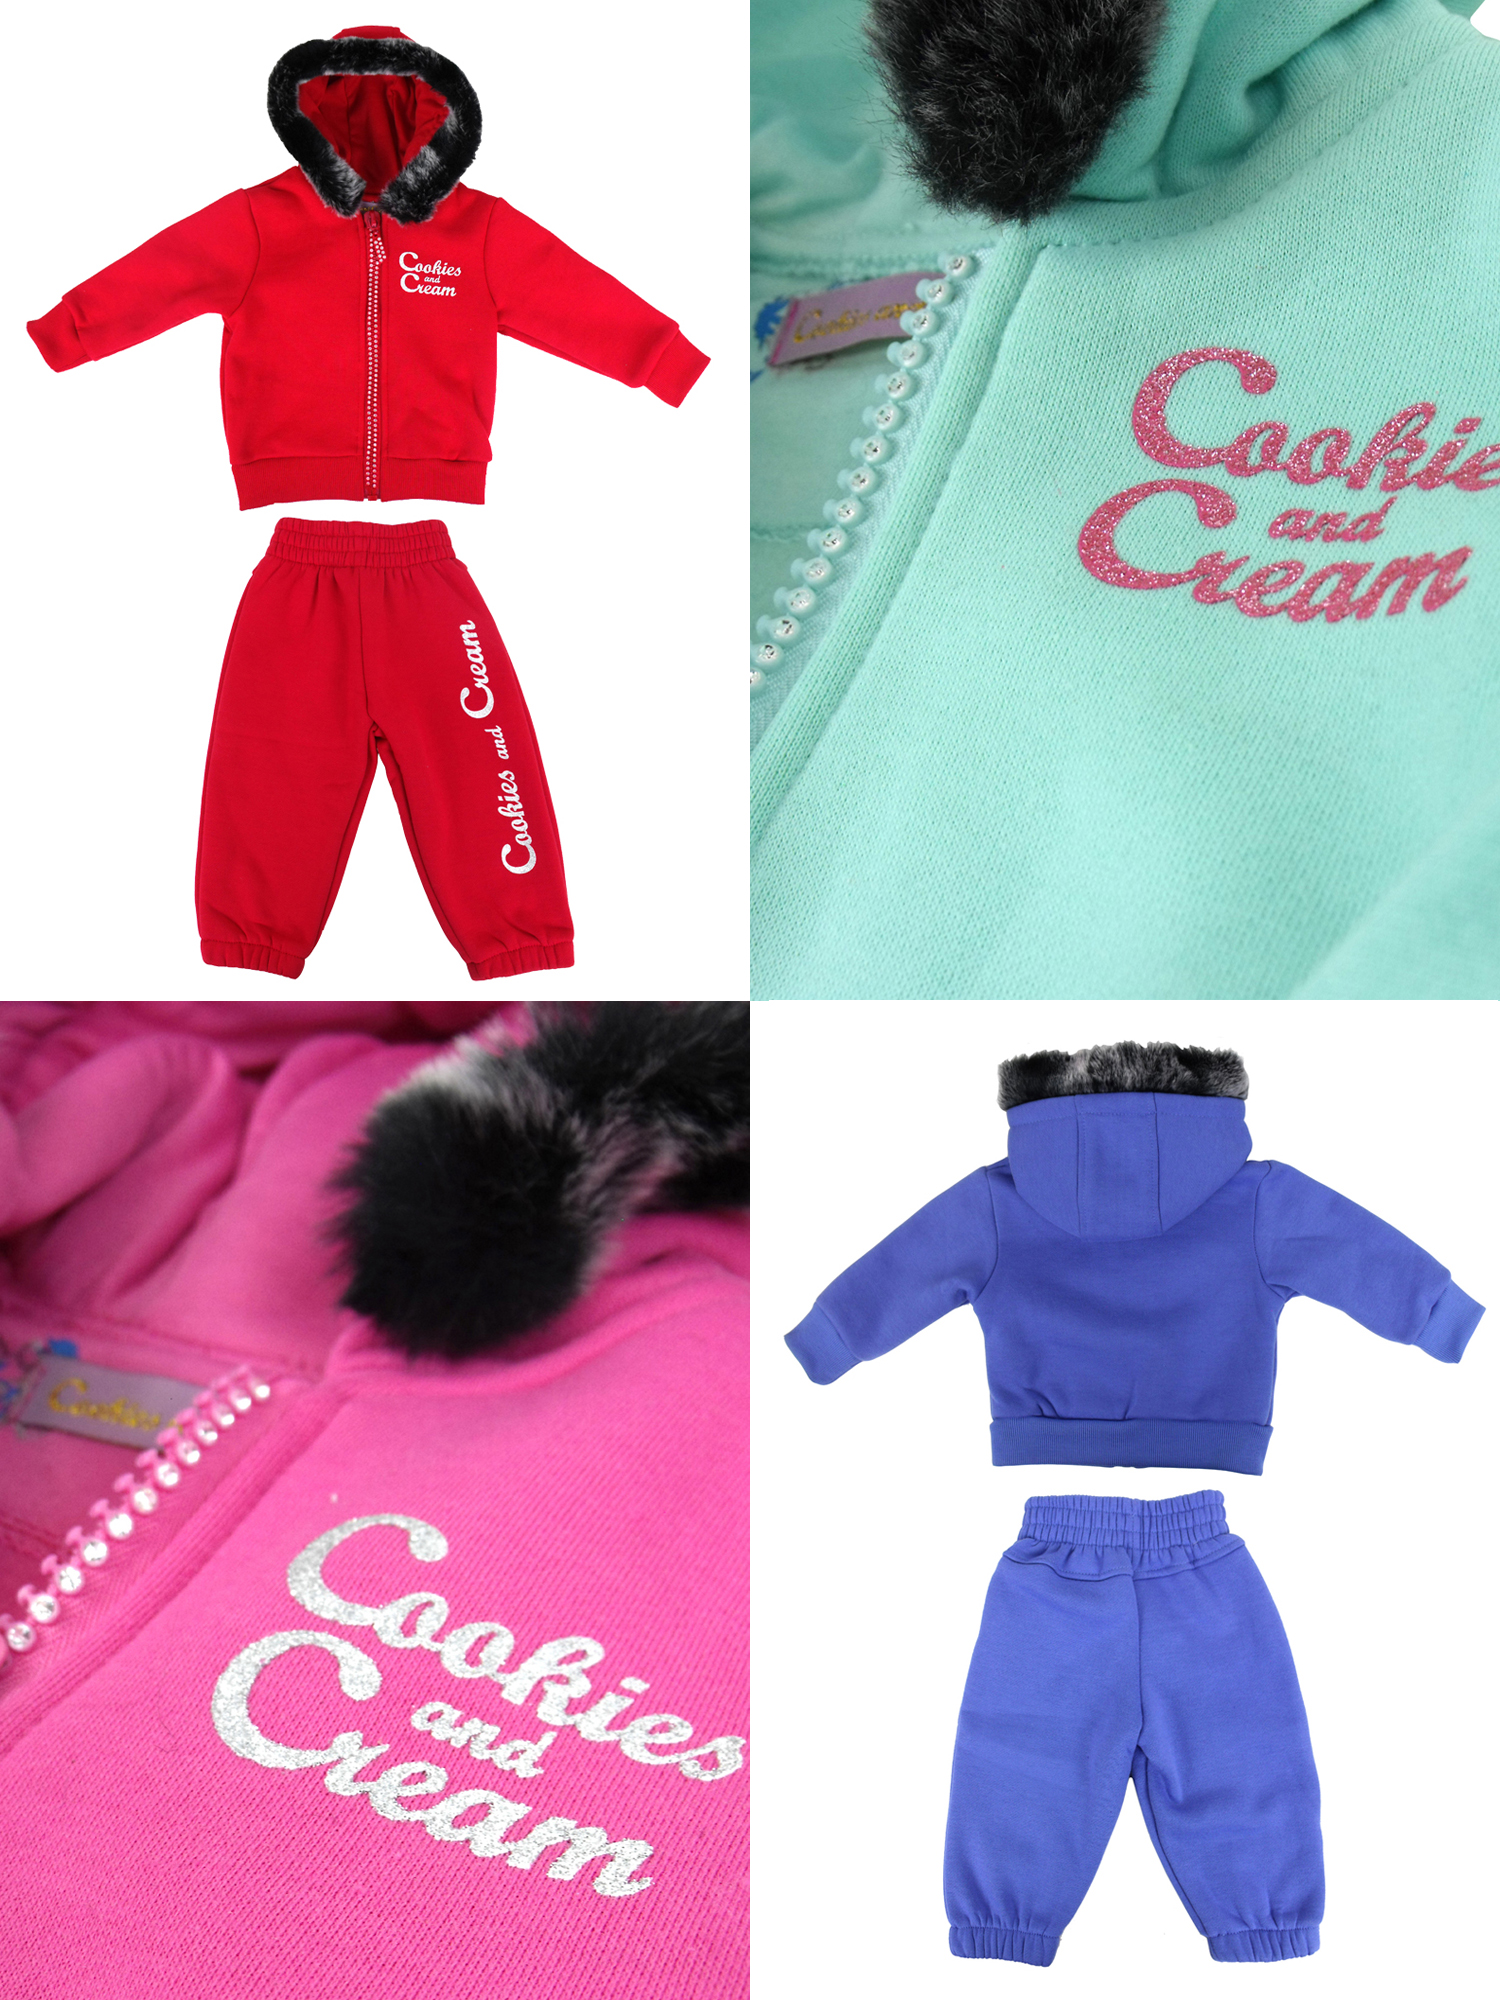 Cookies and Cream Little Girls Baby Infants Full Fleece Tracksuit Hoody Diamante Glitter Bling